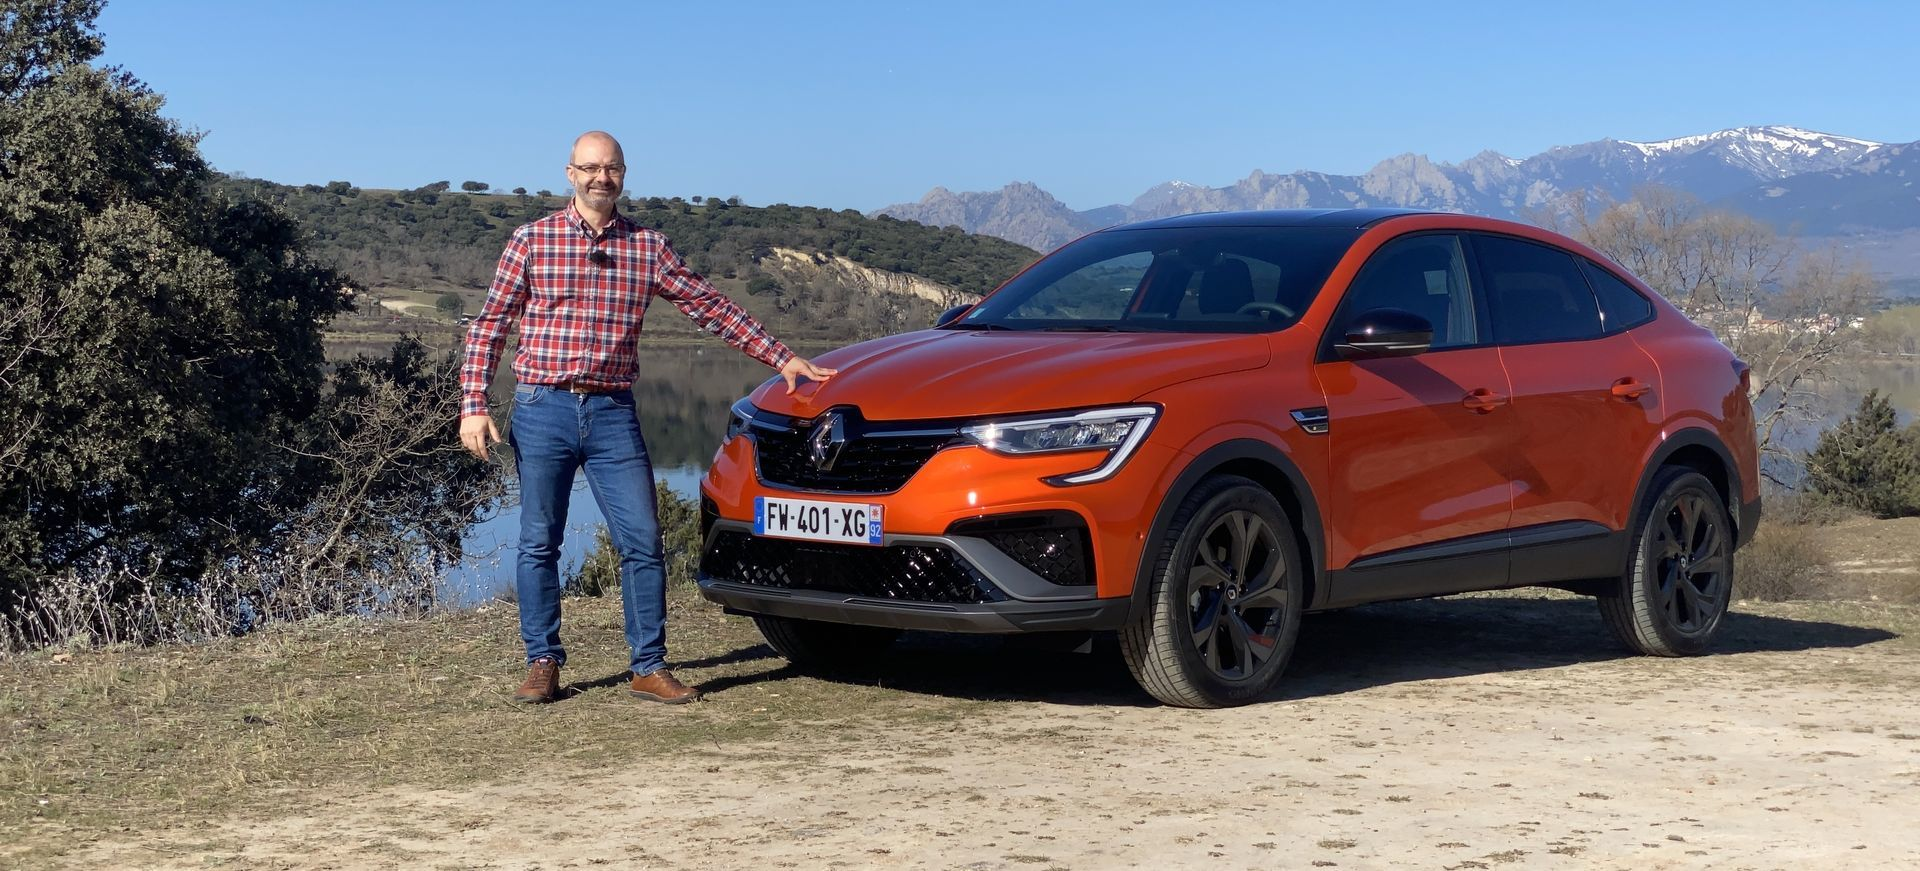 Renault Arkana Portada Prueba